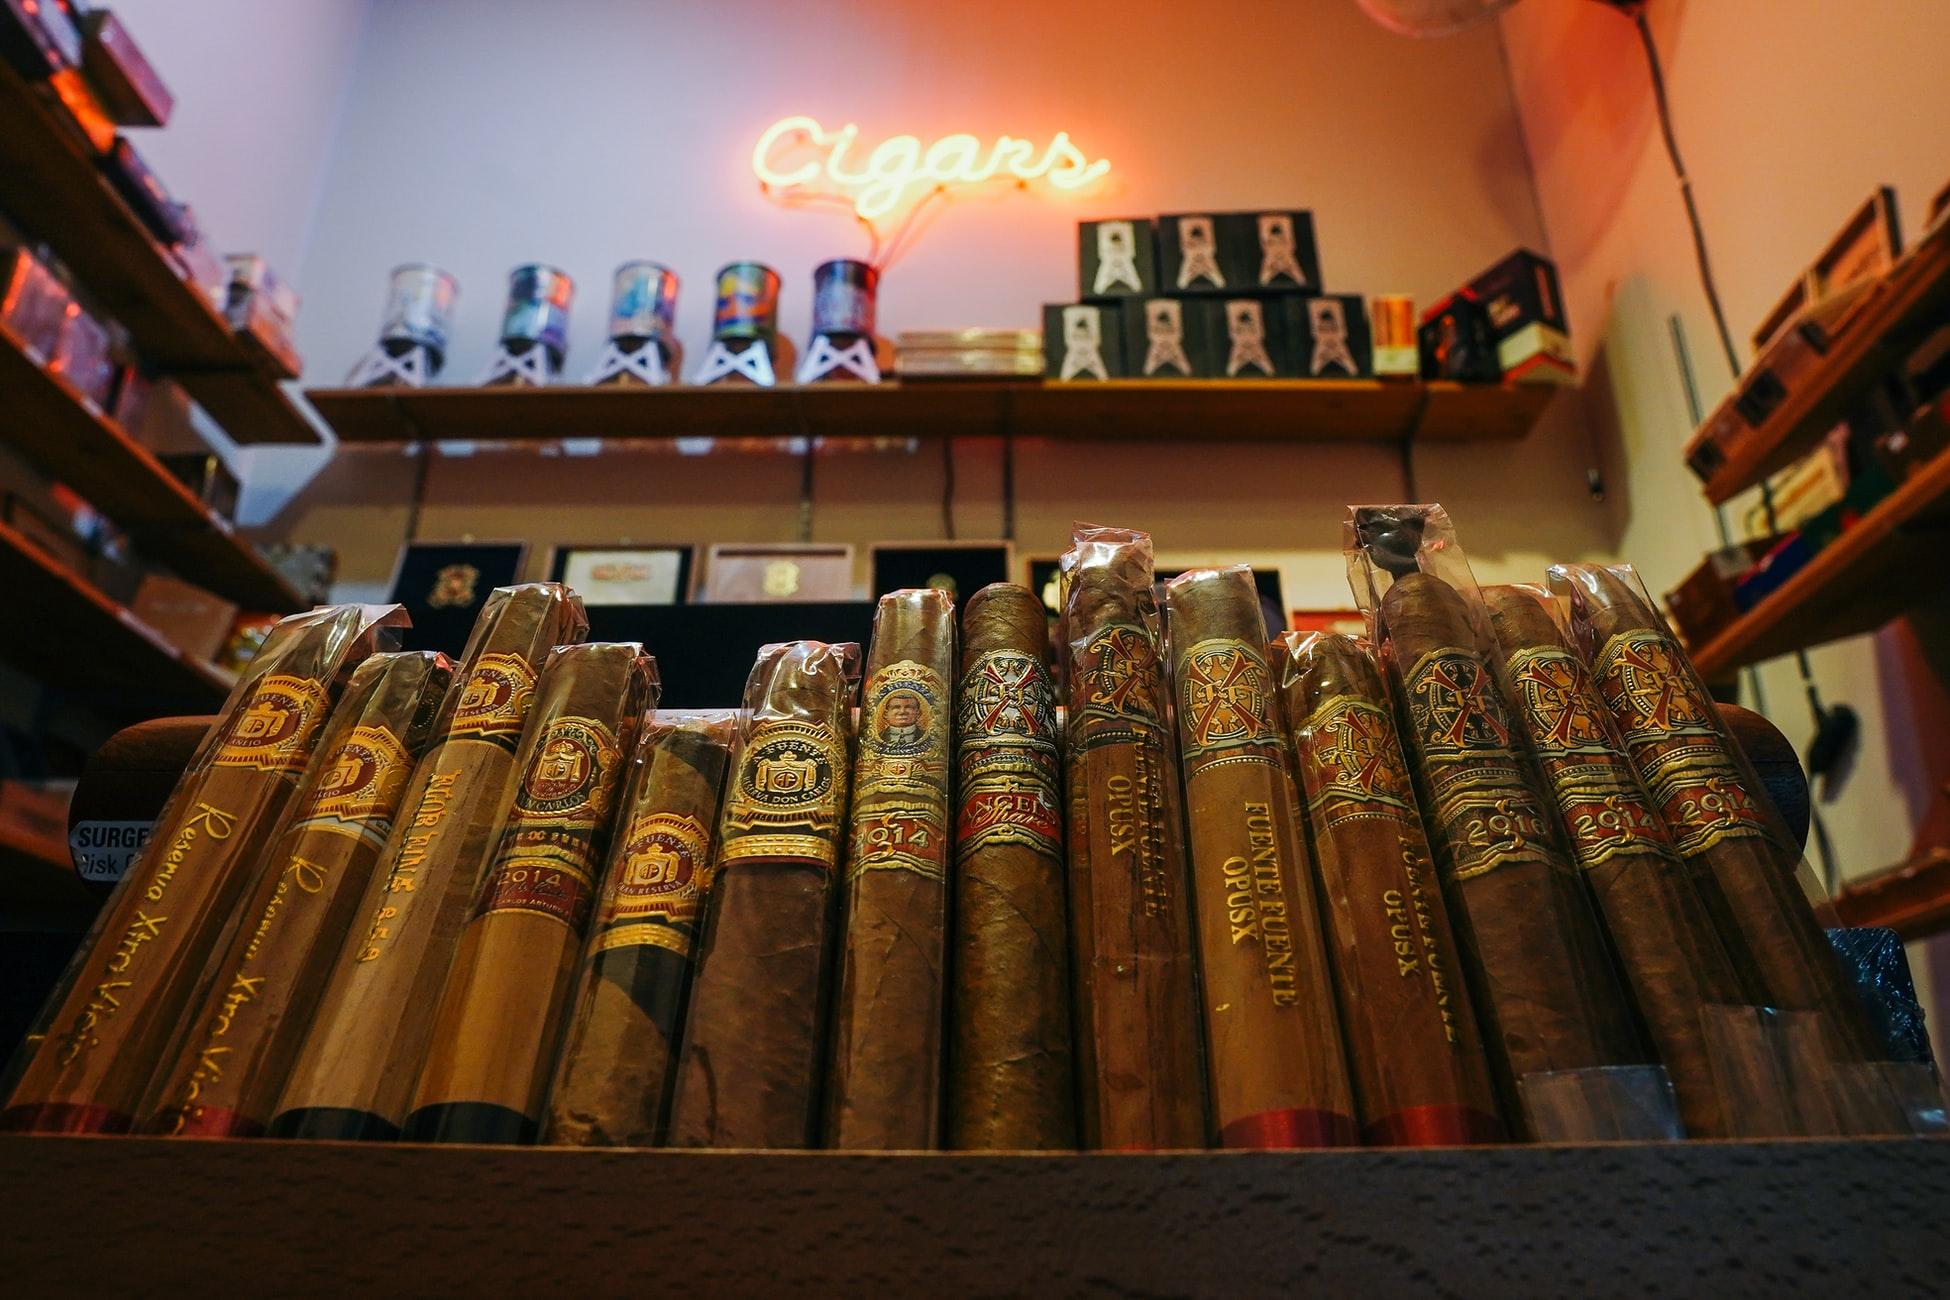 cigars on a shelf